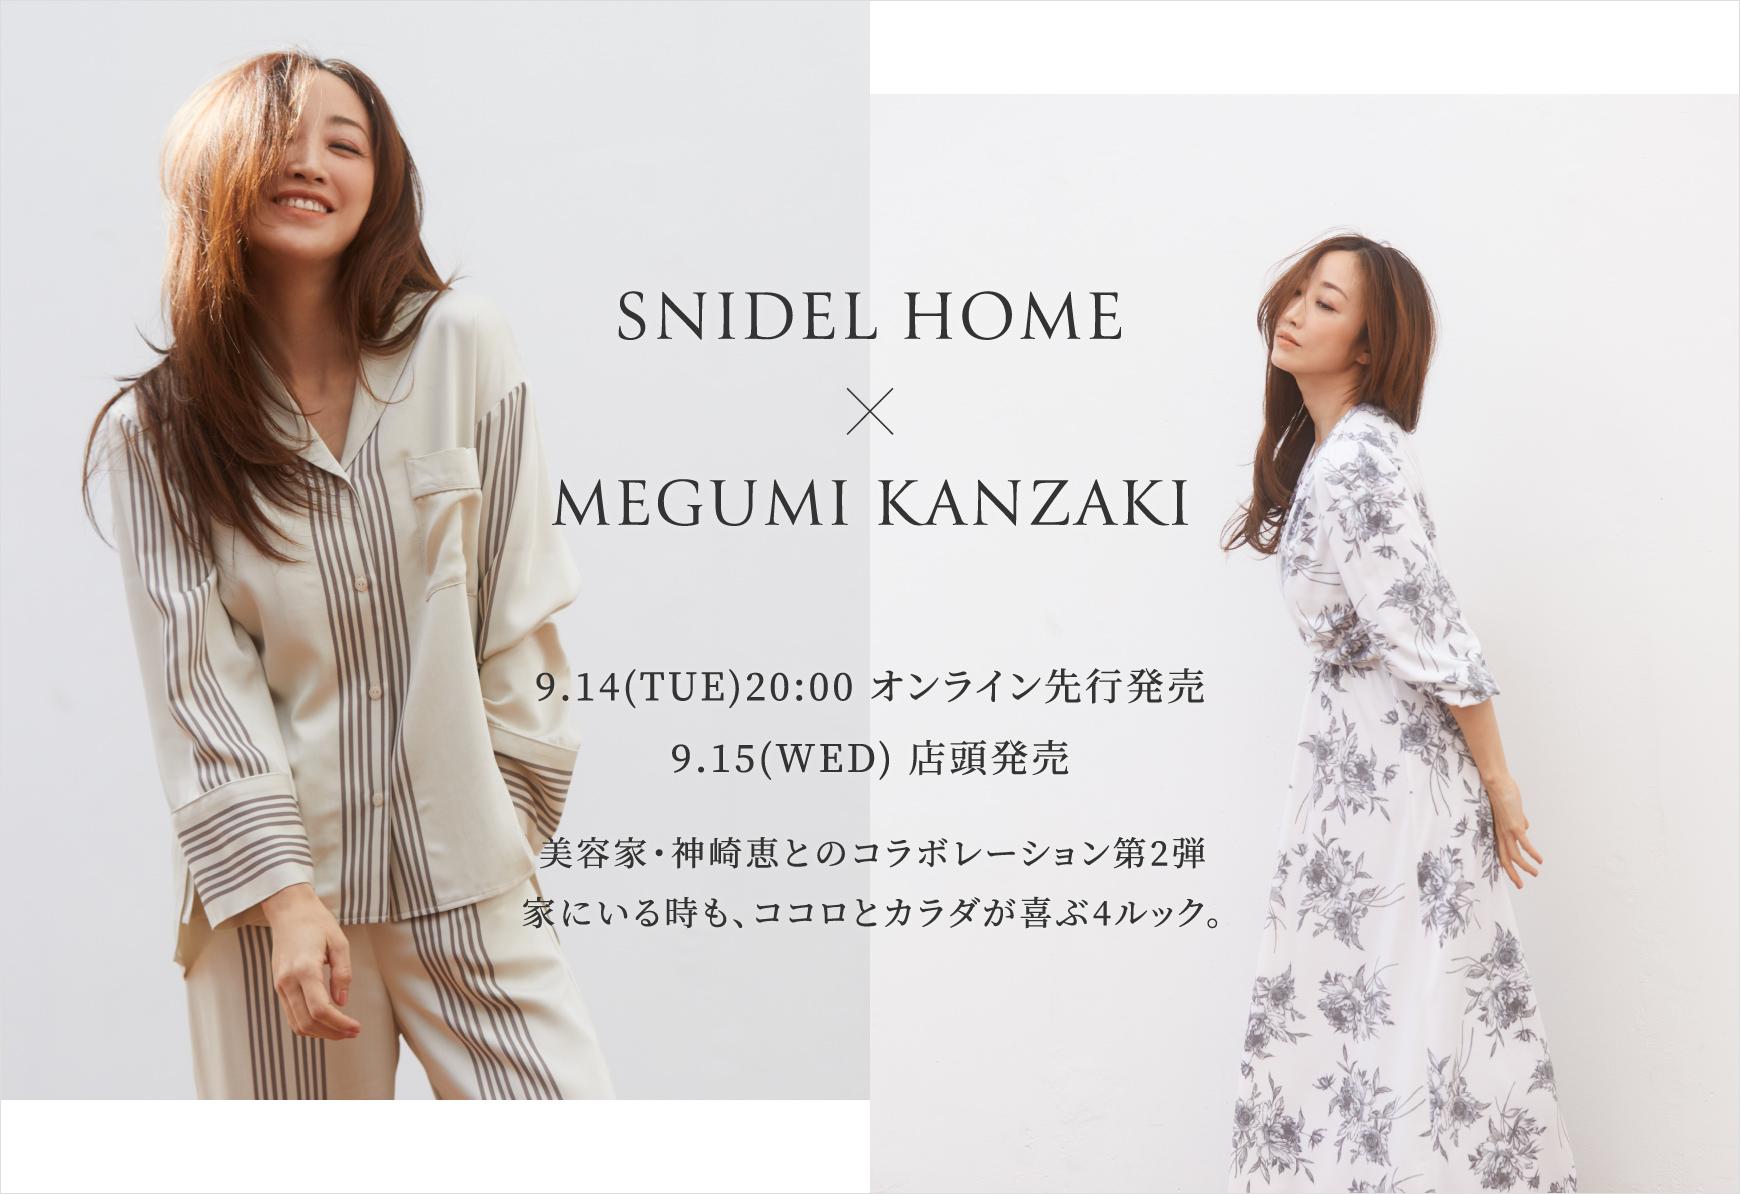 美容家、神崎恵 × SNIDEL HOME